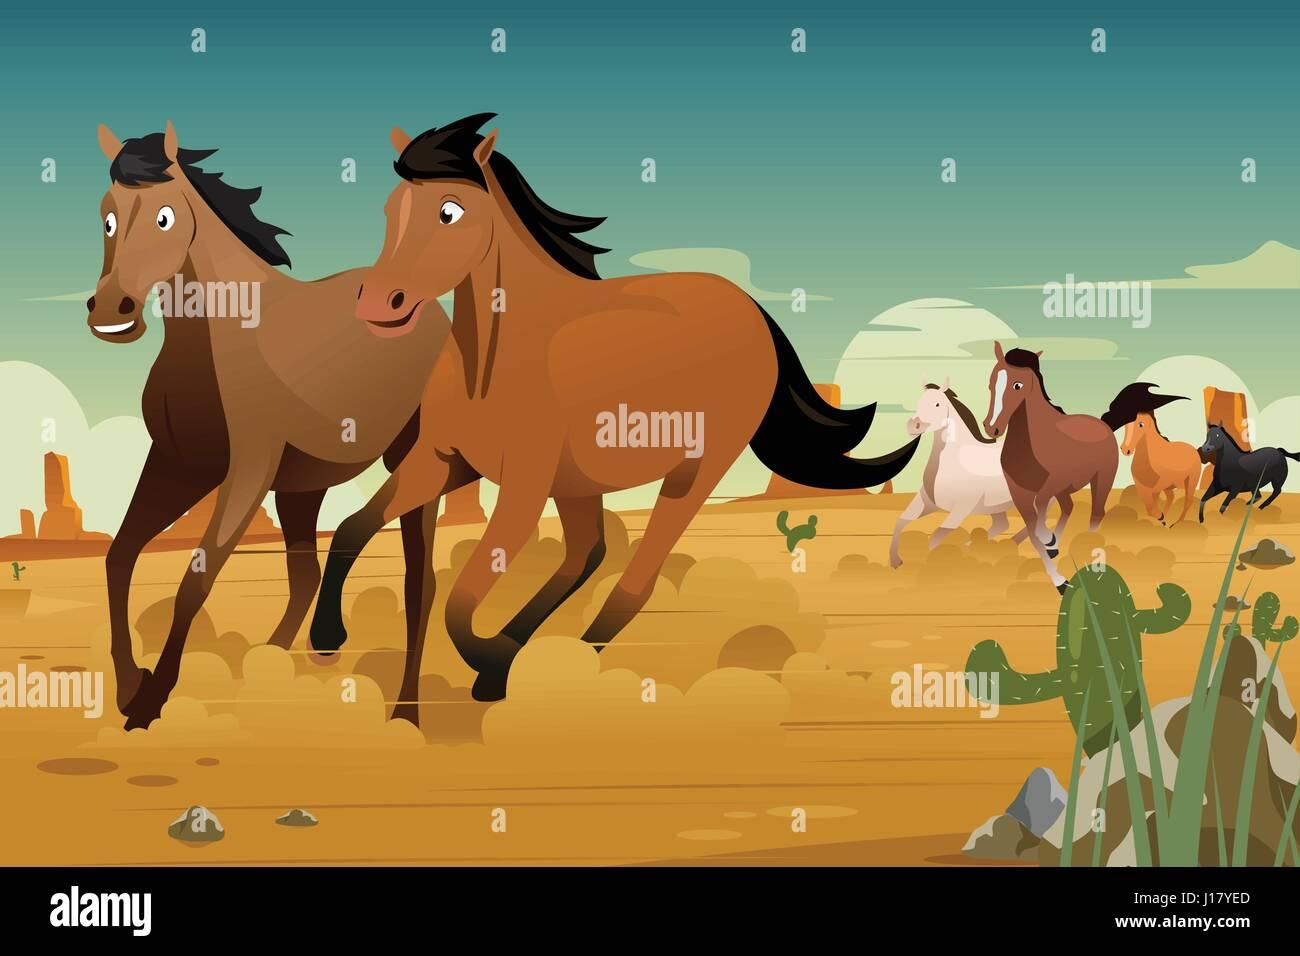 A Vector Illustration Of Wild Horses Running On The Desert Stock Vector Image Art Alamy